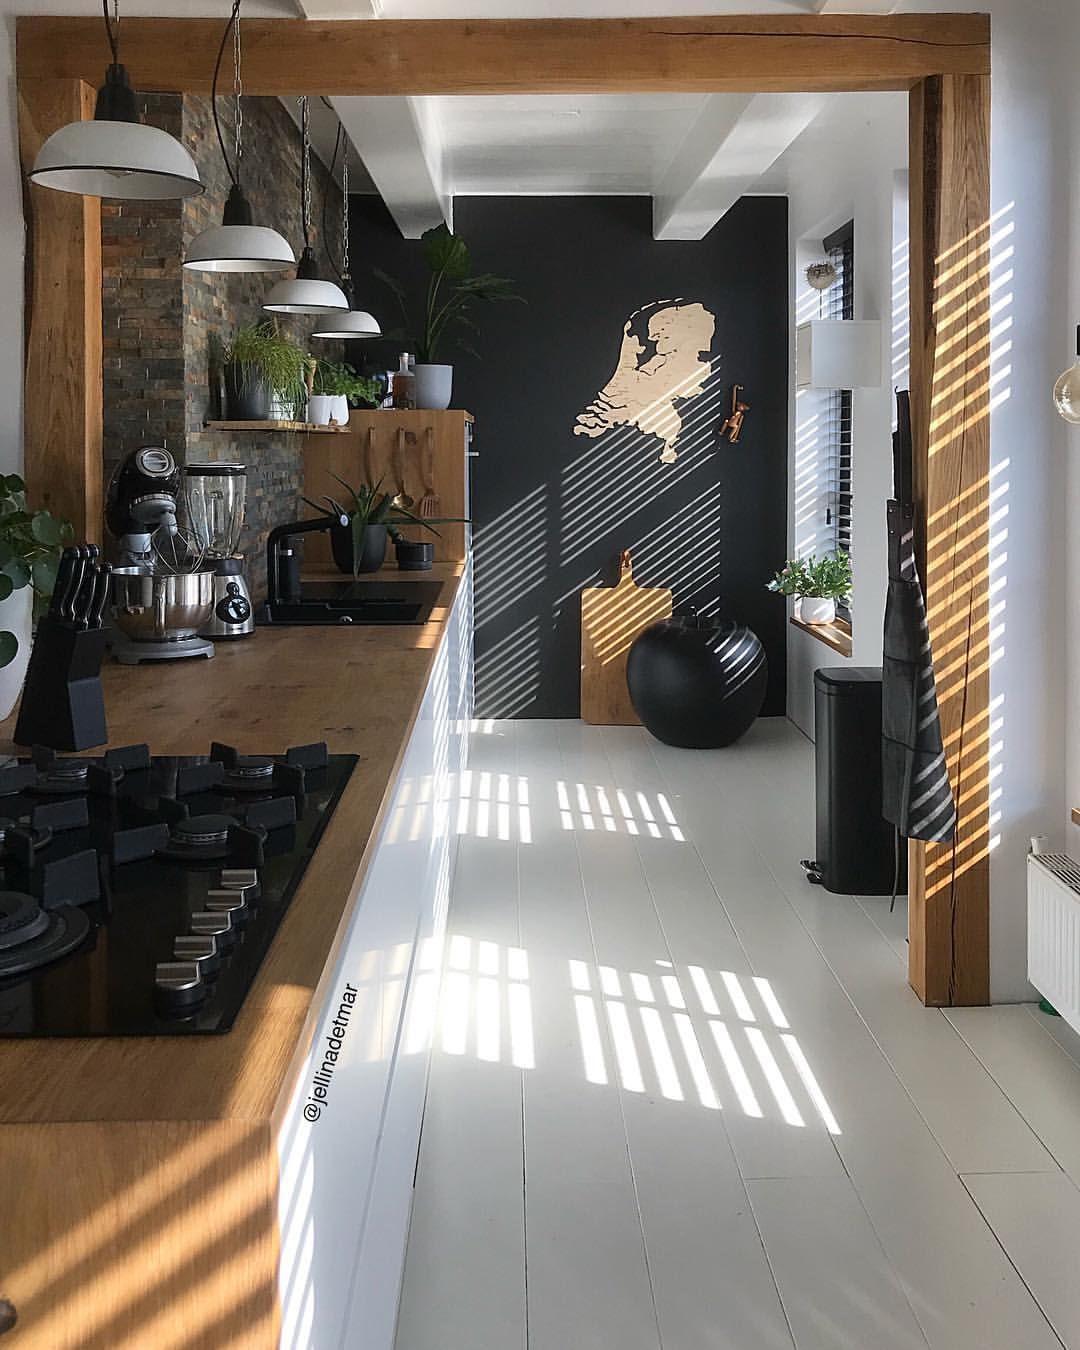 Jellinadetmar On Webstaqram Instagram Posts Videos Stories On Webstaqram Com Webstaqram Interior Interiordesign Homedecor Gm Home Decor Home Deco Home